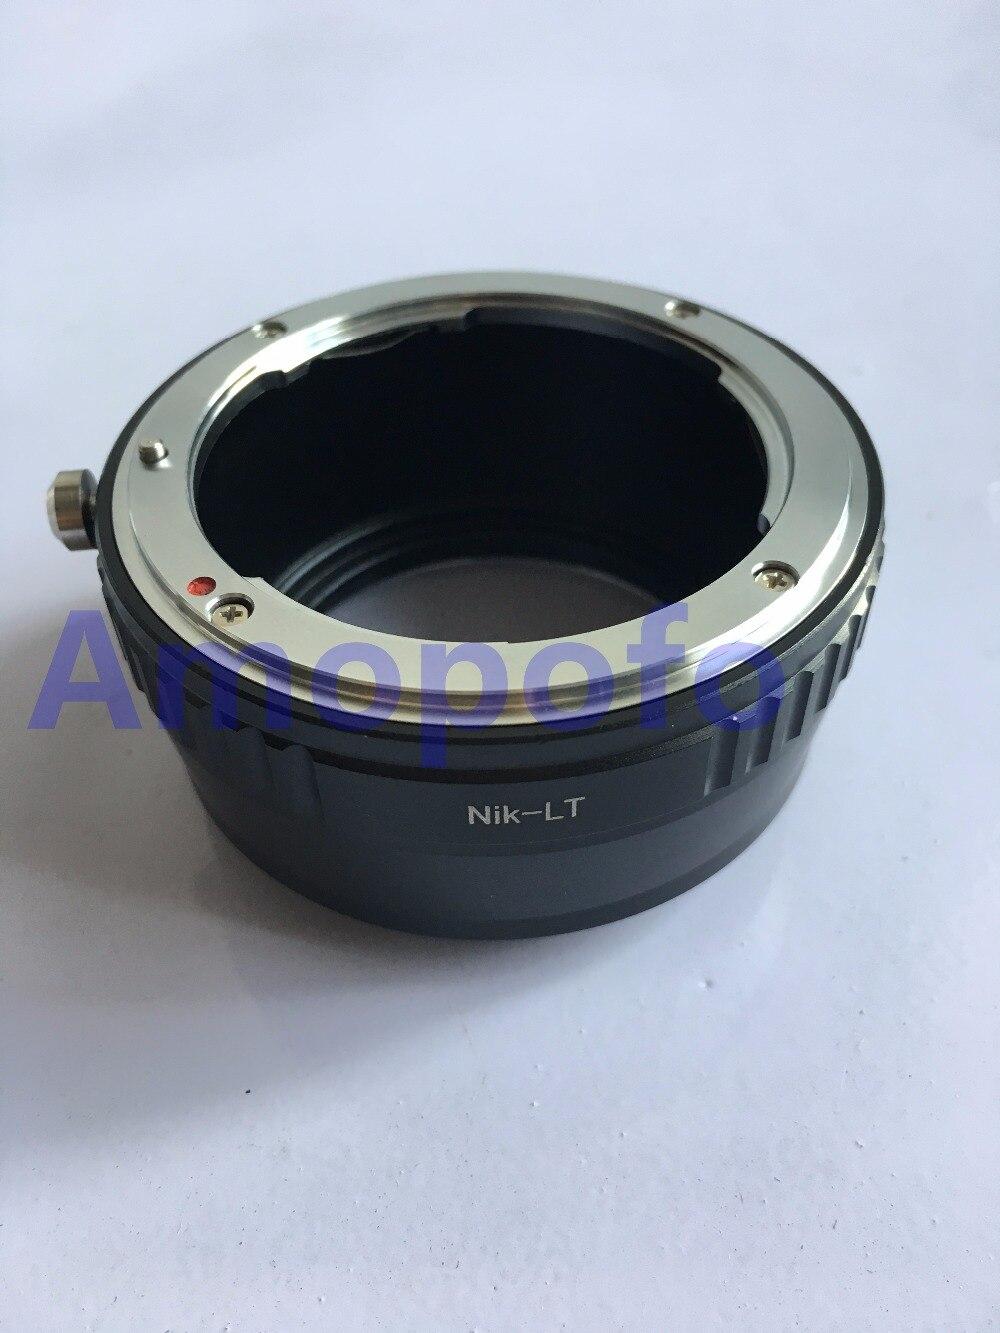 Adaptador Amopofo AI-LT para lente de montaje Nikon F AI para cámara Leica SL T tipo 701 sin espejo